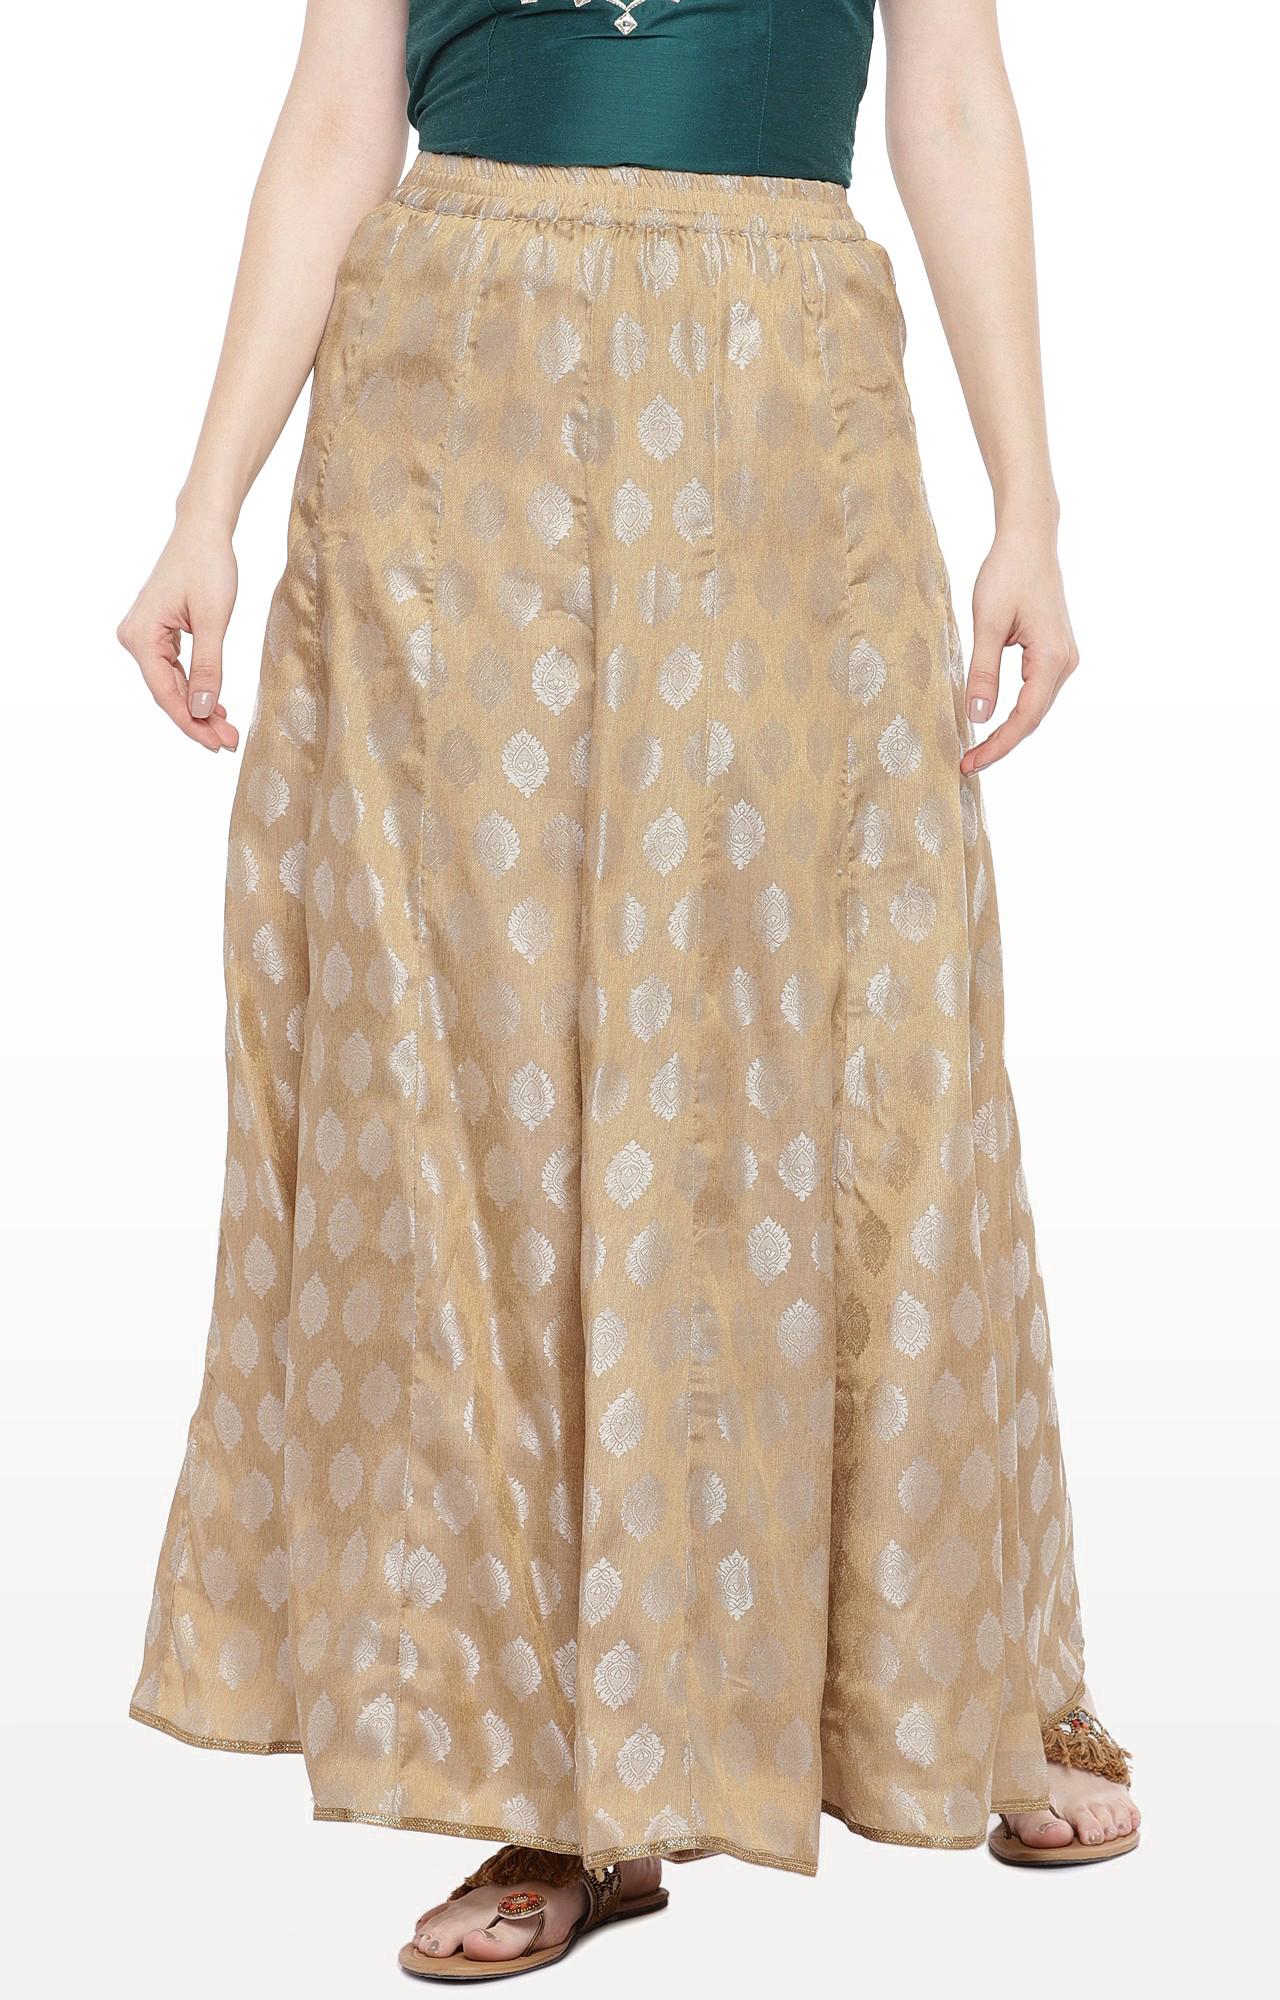 globus | Gold Printed Flared Skirt